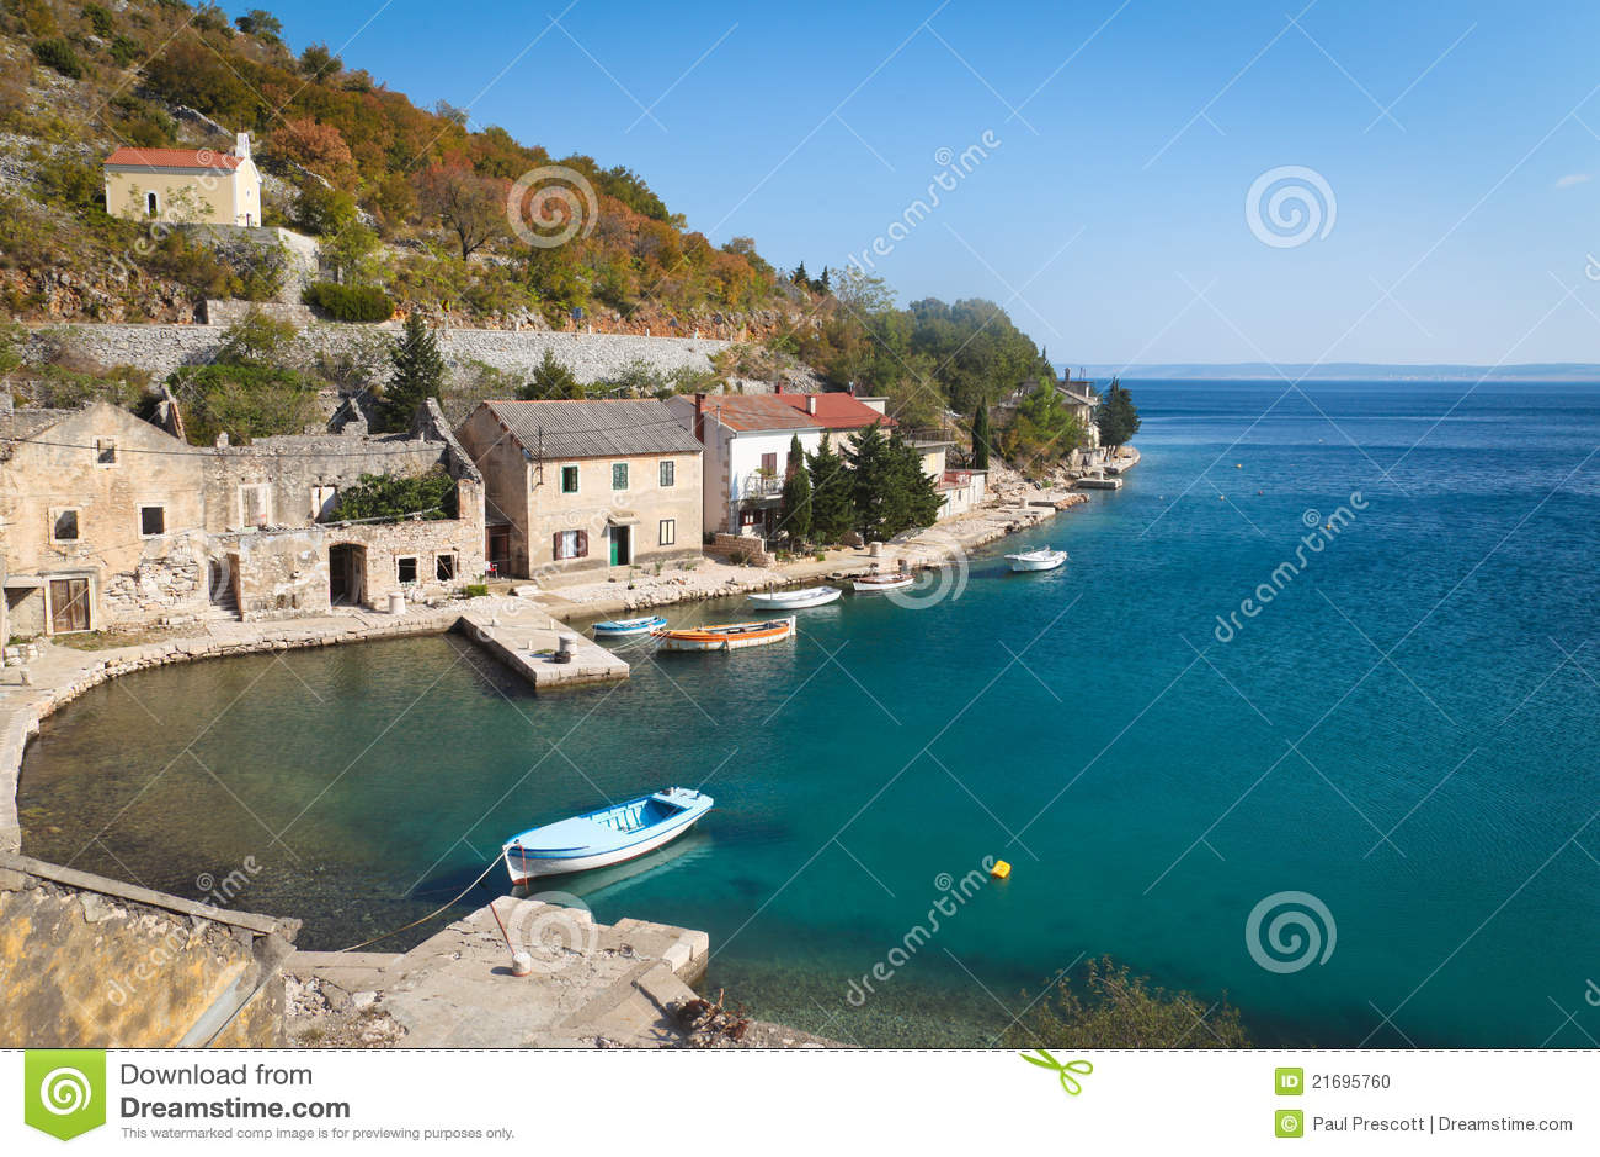 Fishing village in croatia stock photo image 21695760 for Fishing in croatia